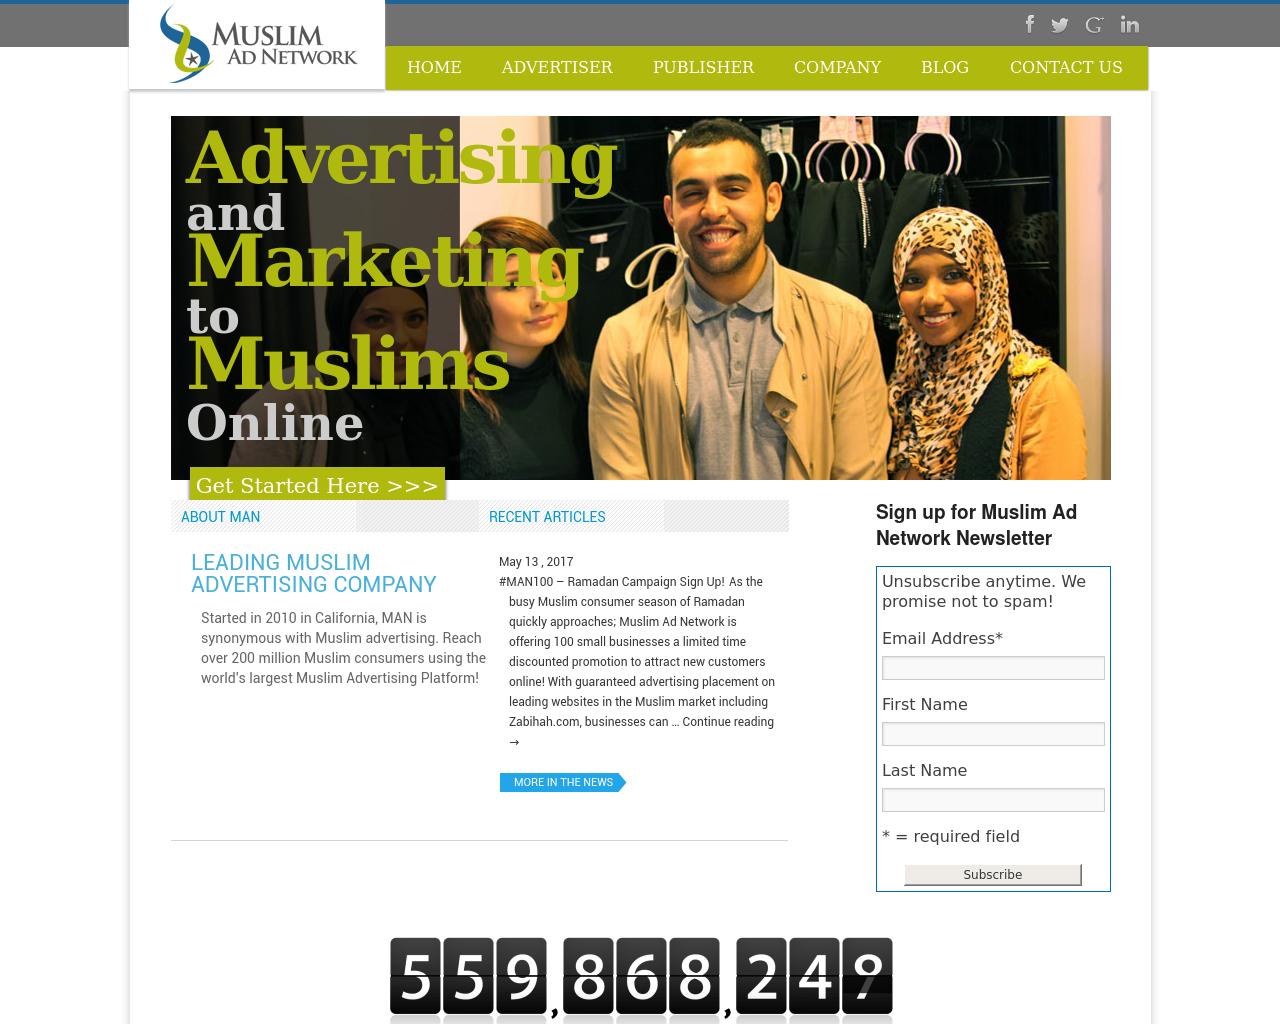 Muslim-Ad-Network-Advertising-Reviews-Pricing